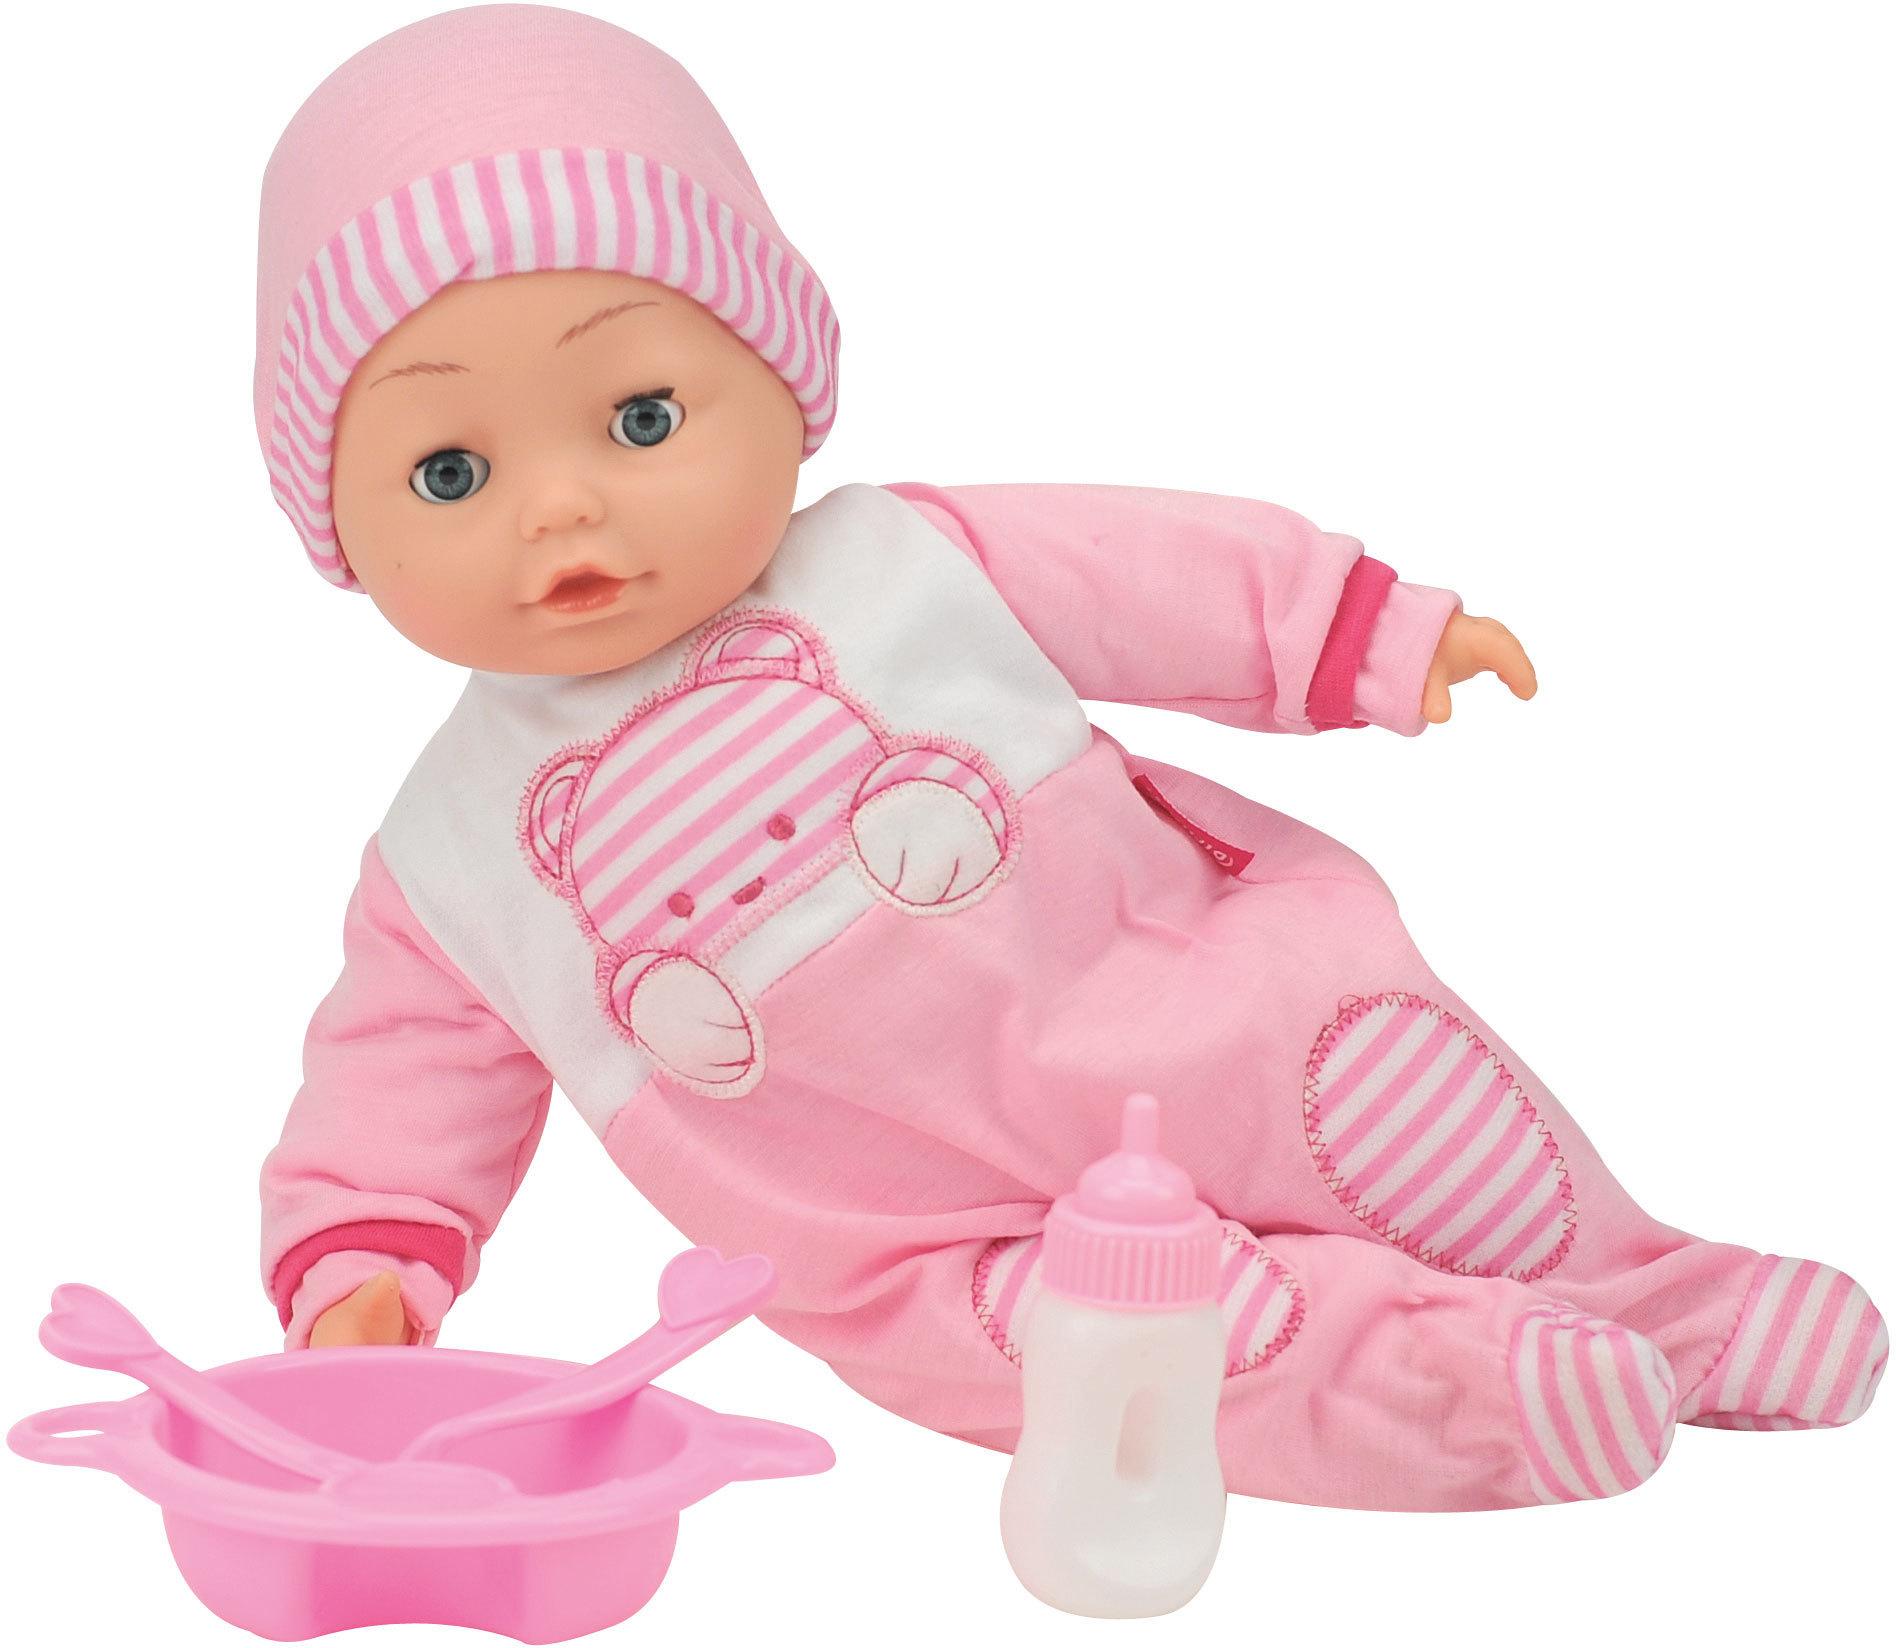 bambolina jasmine suomea puhuva nukke 40cm vauvanuket. Black Bedroom Furniture Sets. Home Design Ideas